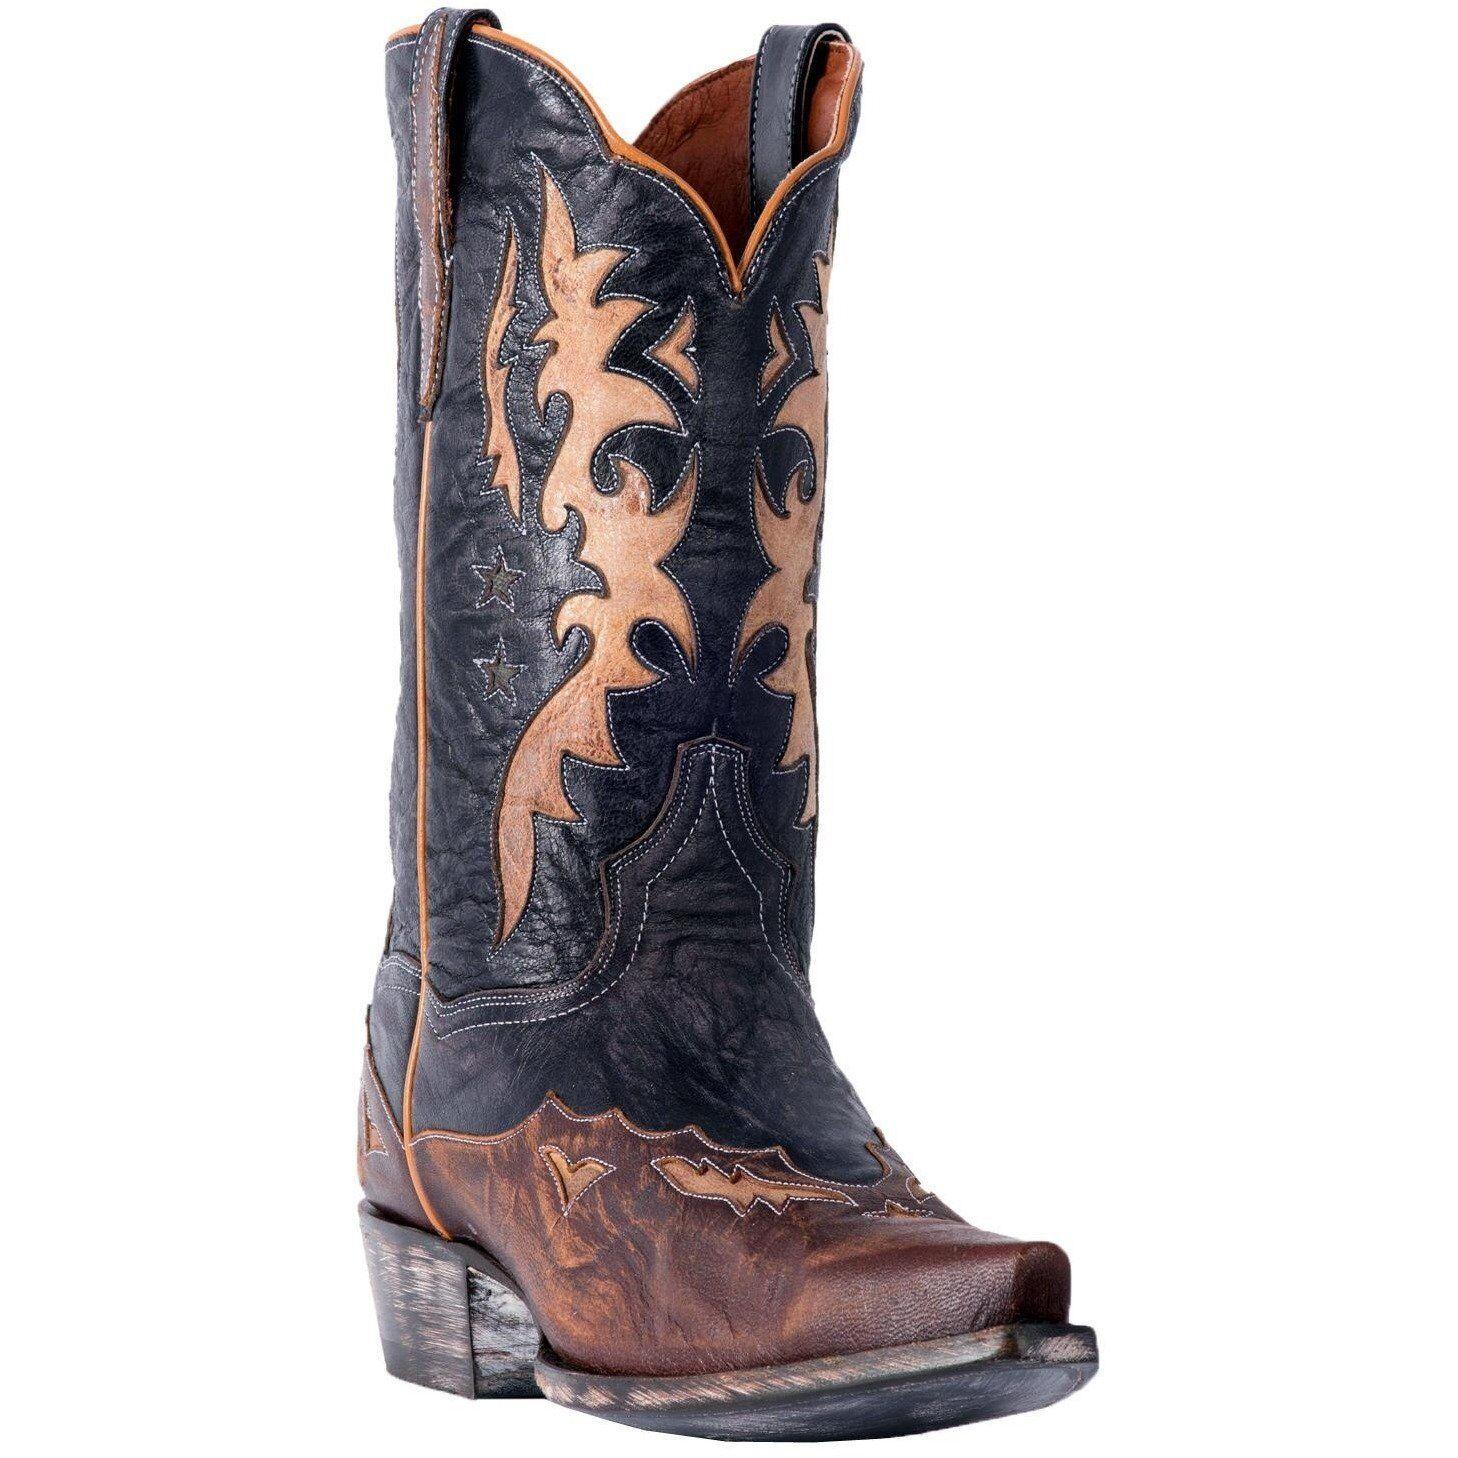 Dan Post Kellen DP2565 Men's Marronee Rustic Leather Cowboy stivali